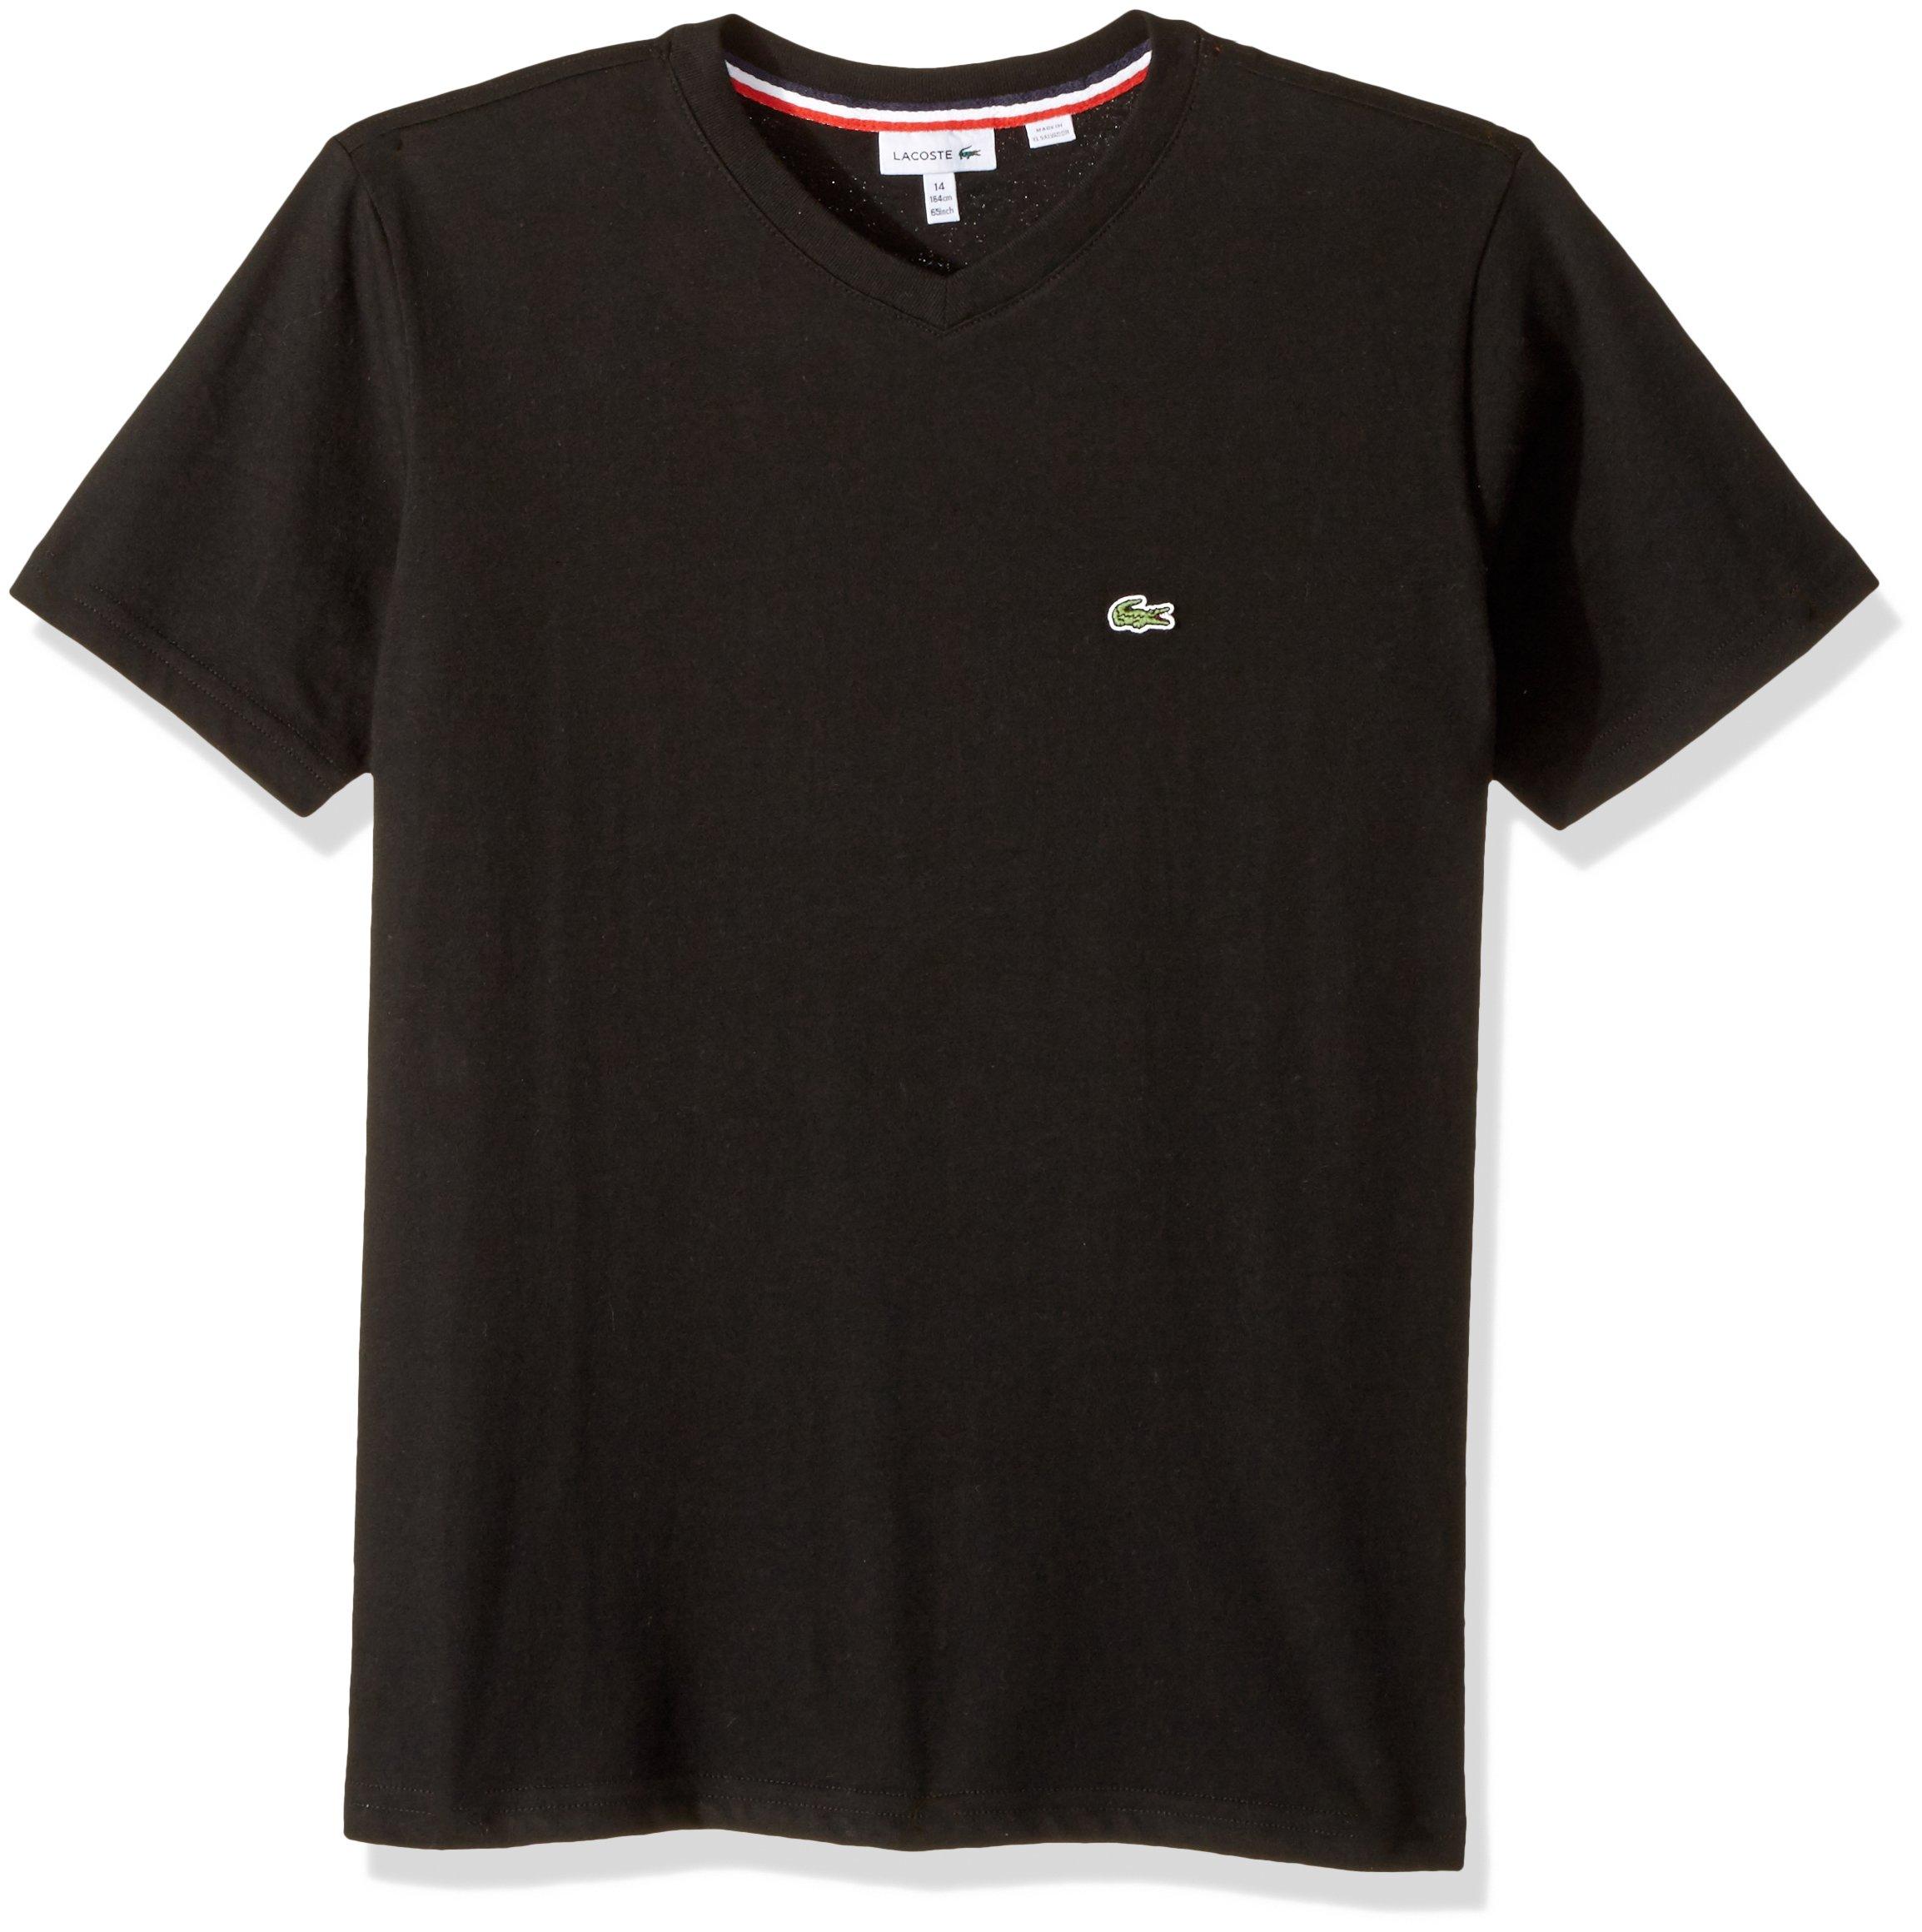 Lacoste Boys' Big' V-Neck Cotton T-Shirt, Black, 8Y